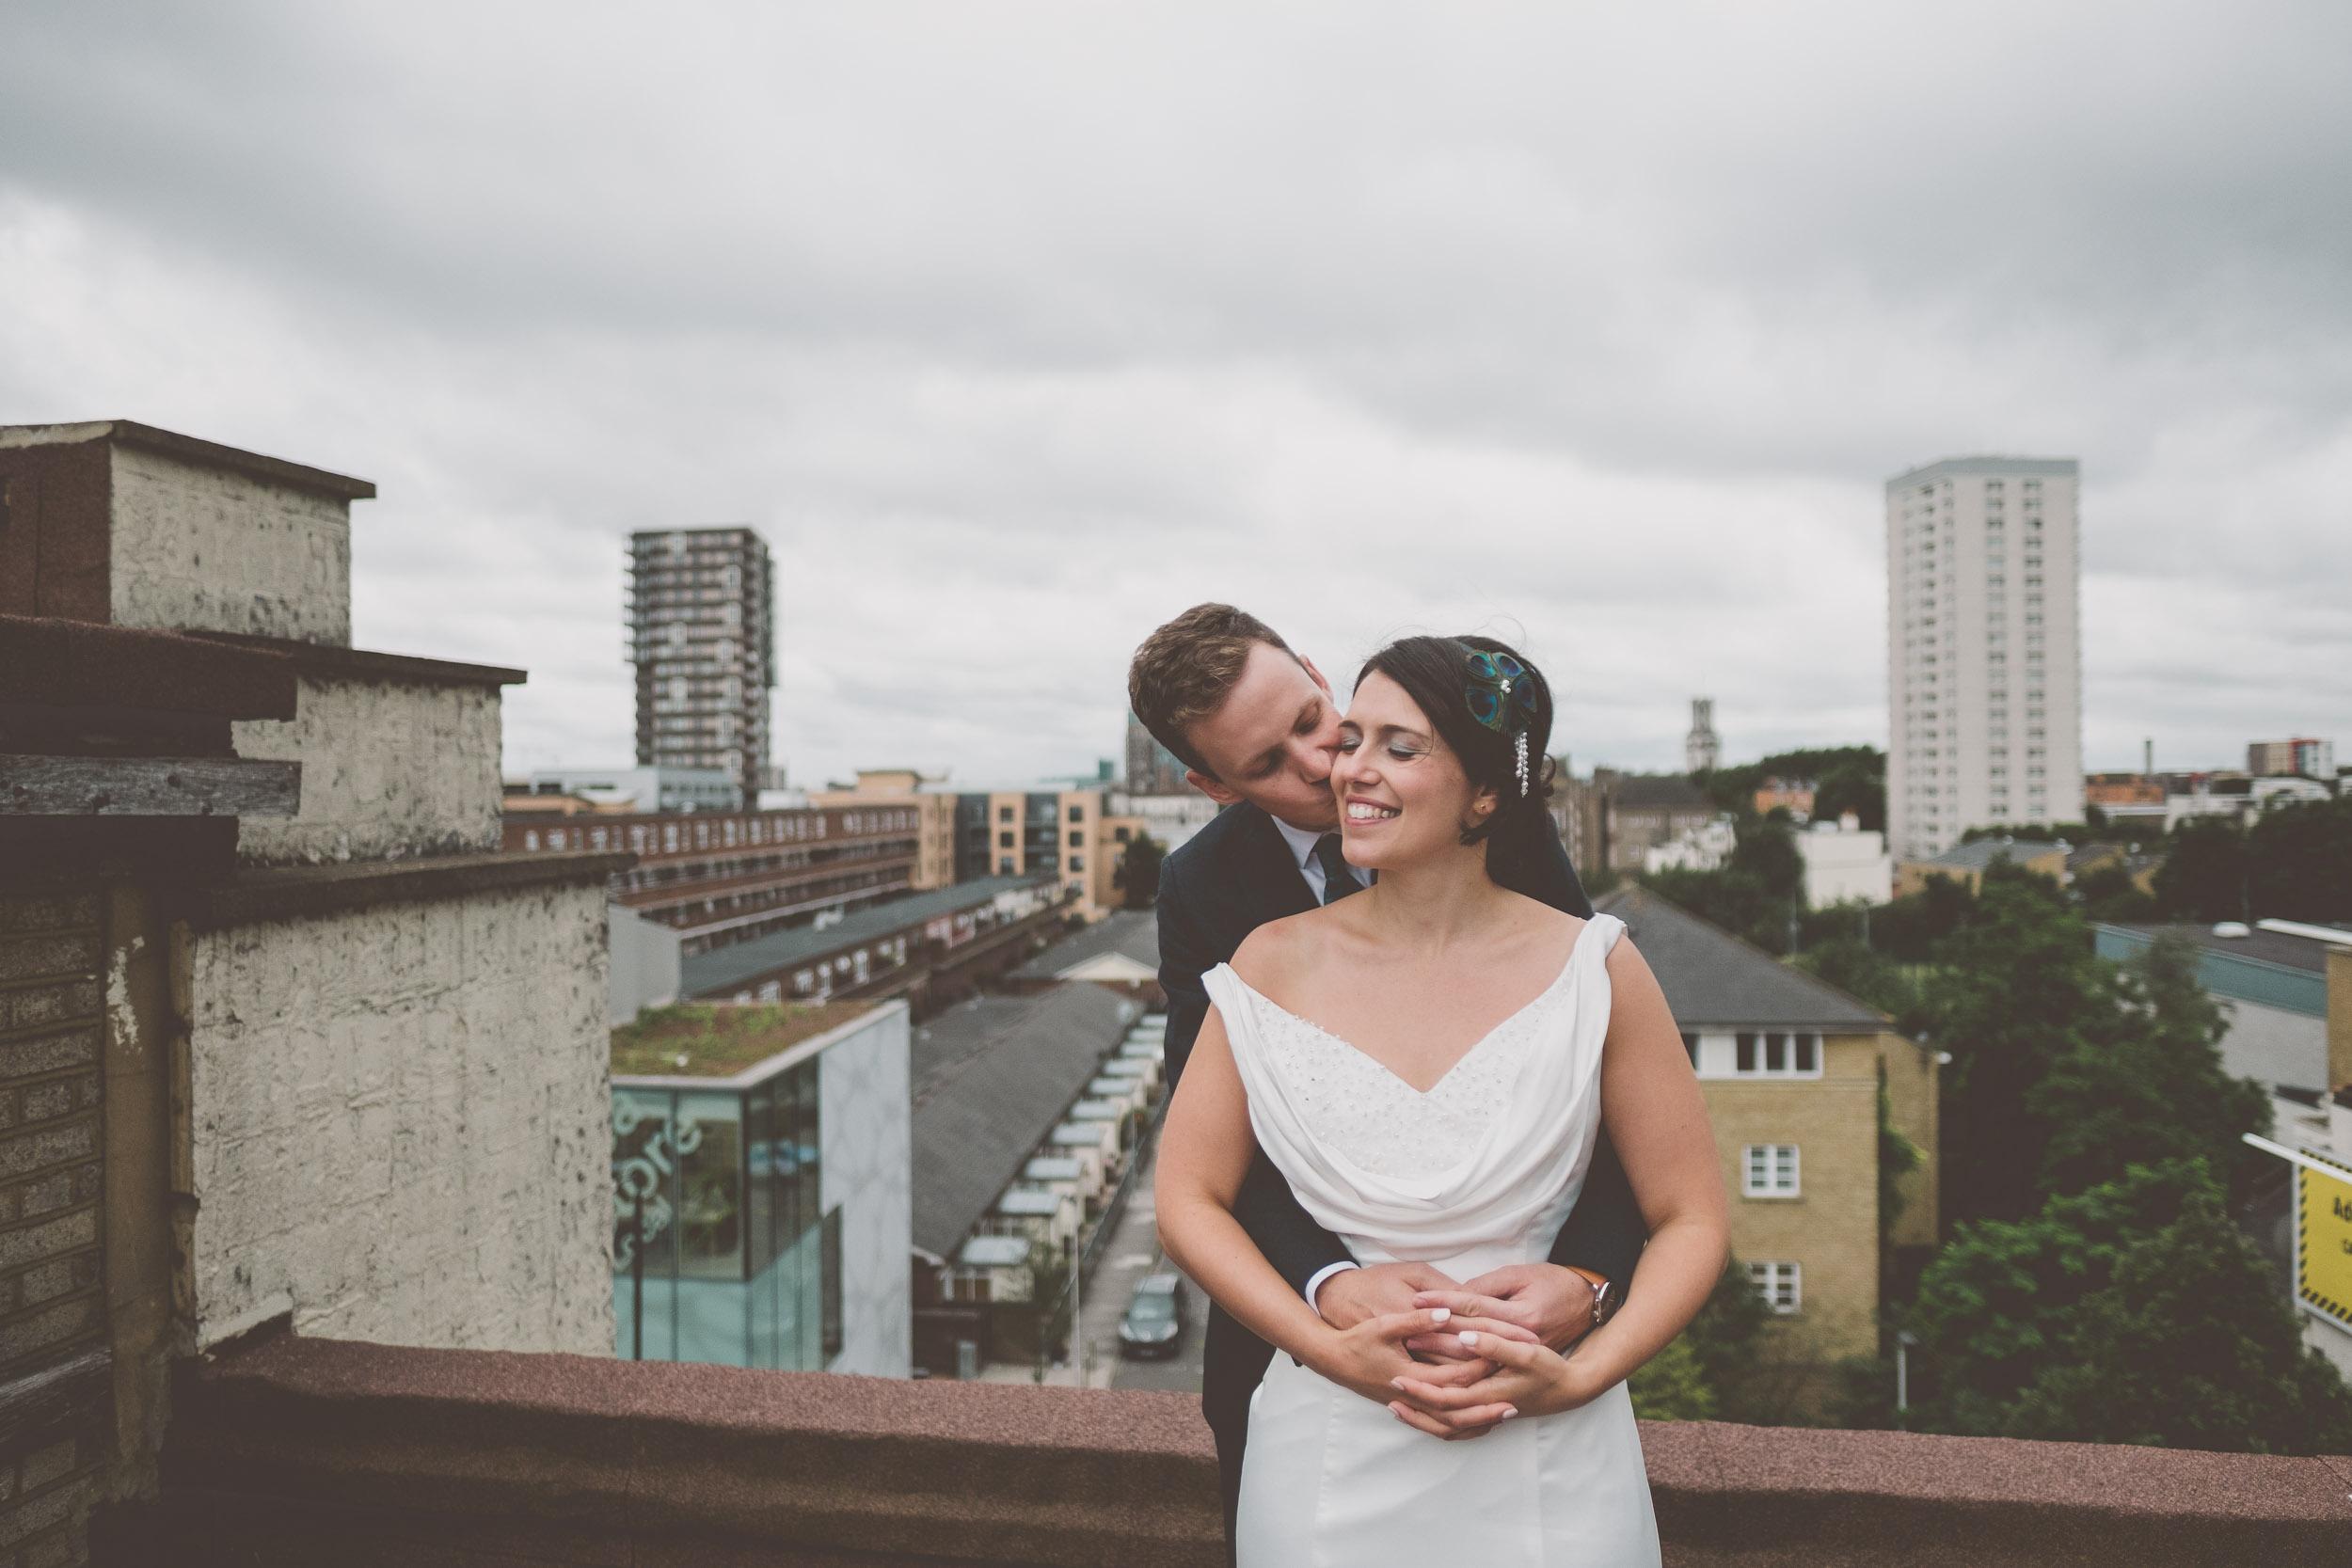 islington-town-hall-4th-floor-studios-wedding294.jpg